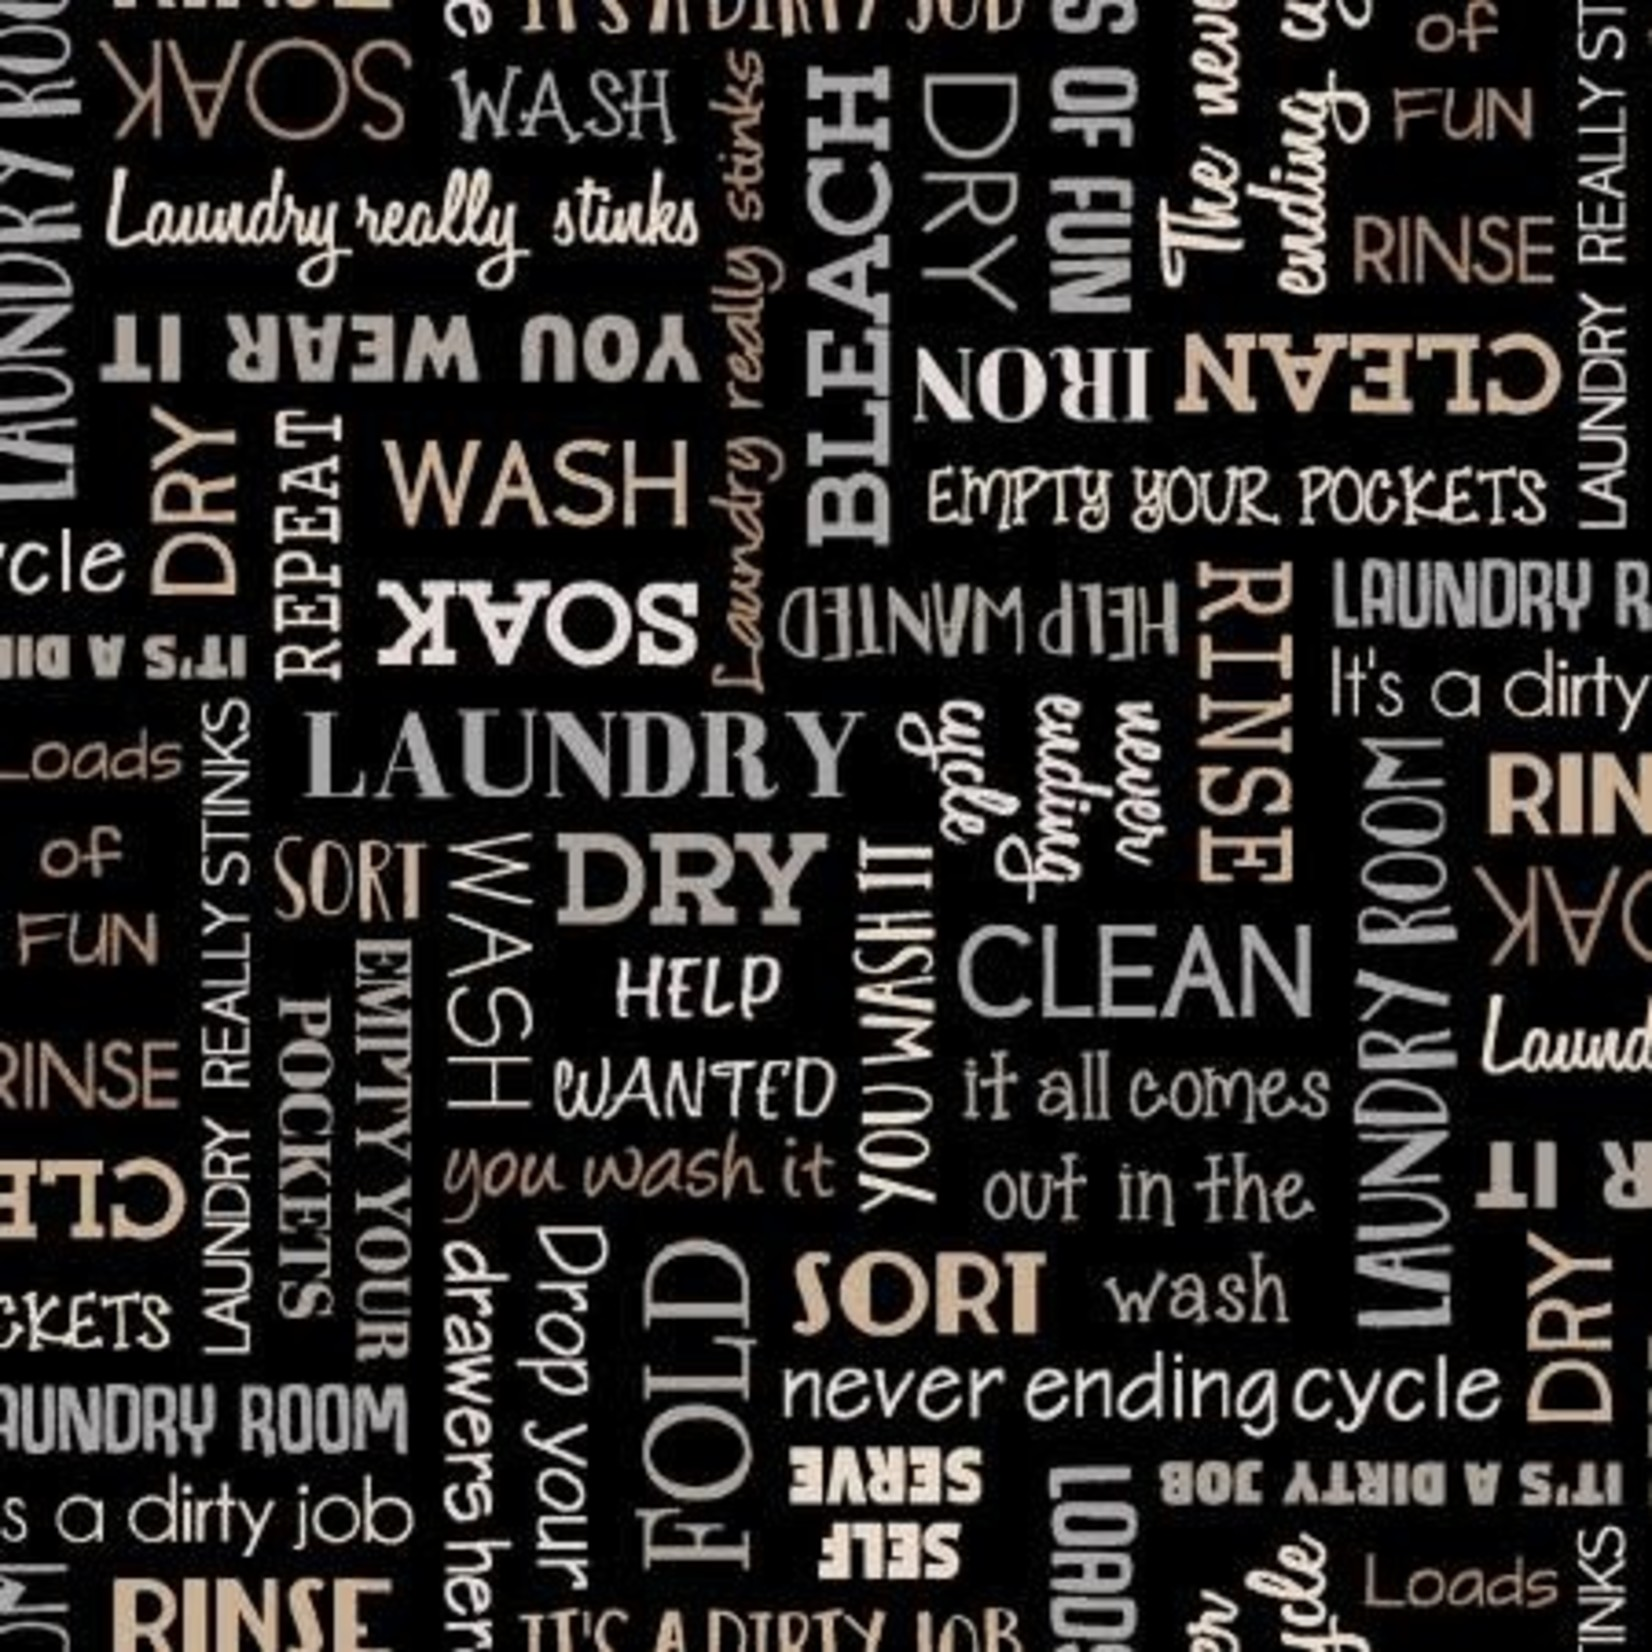 Studio E Fabrics Loads of Fun - Words - Black